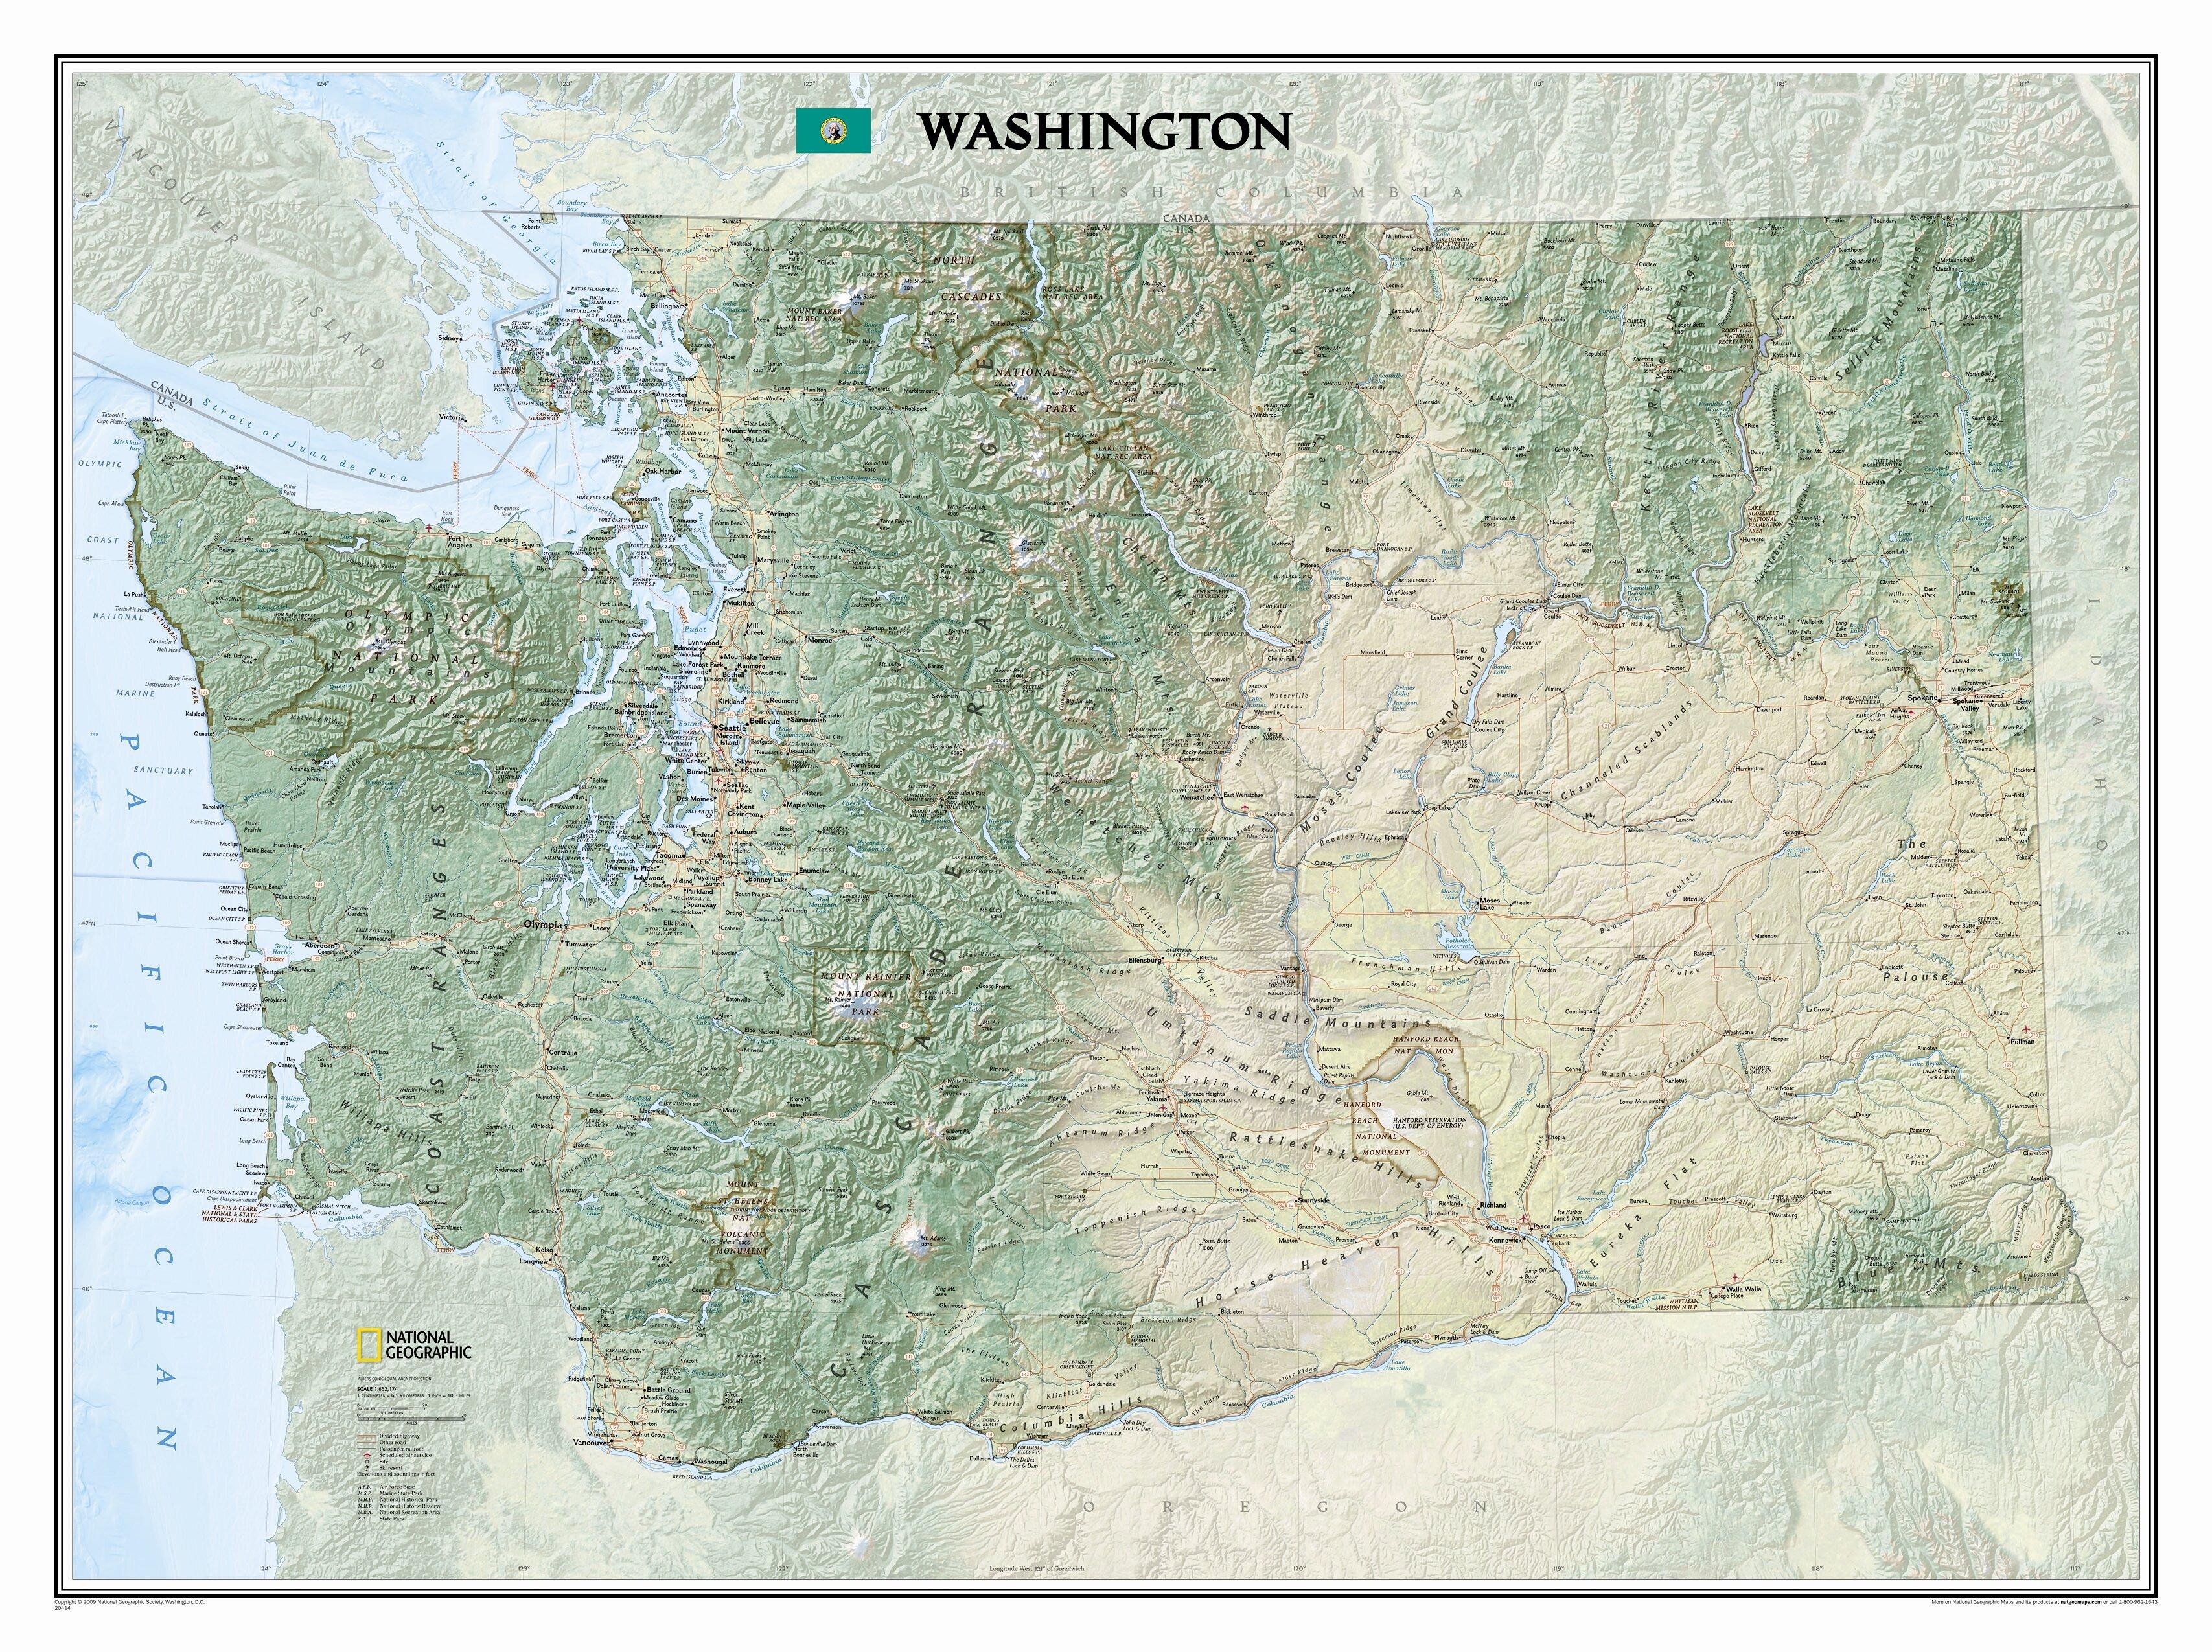 National Geographic Maps Washington State Wall Map | Wayfair